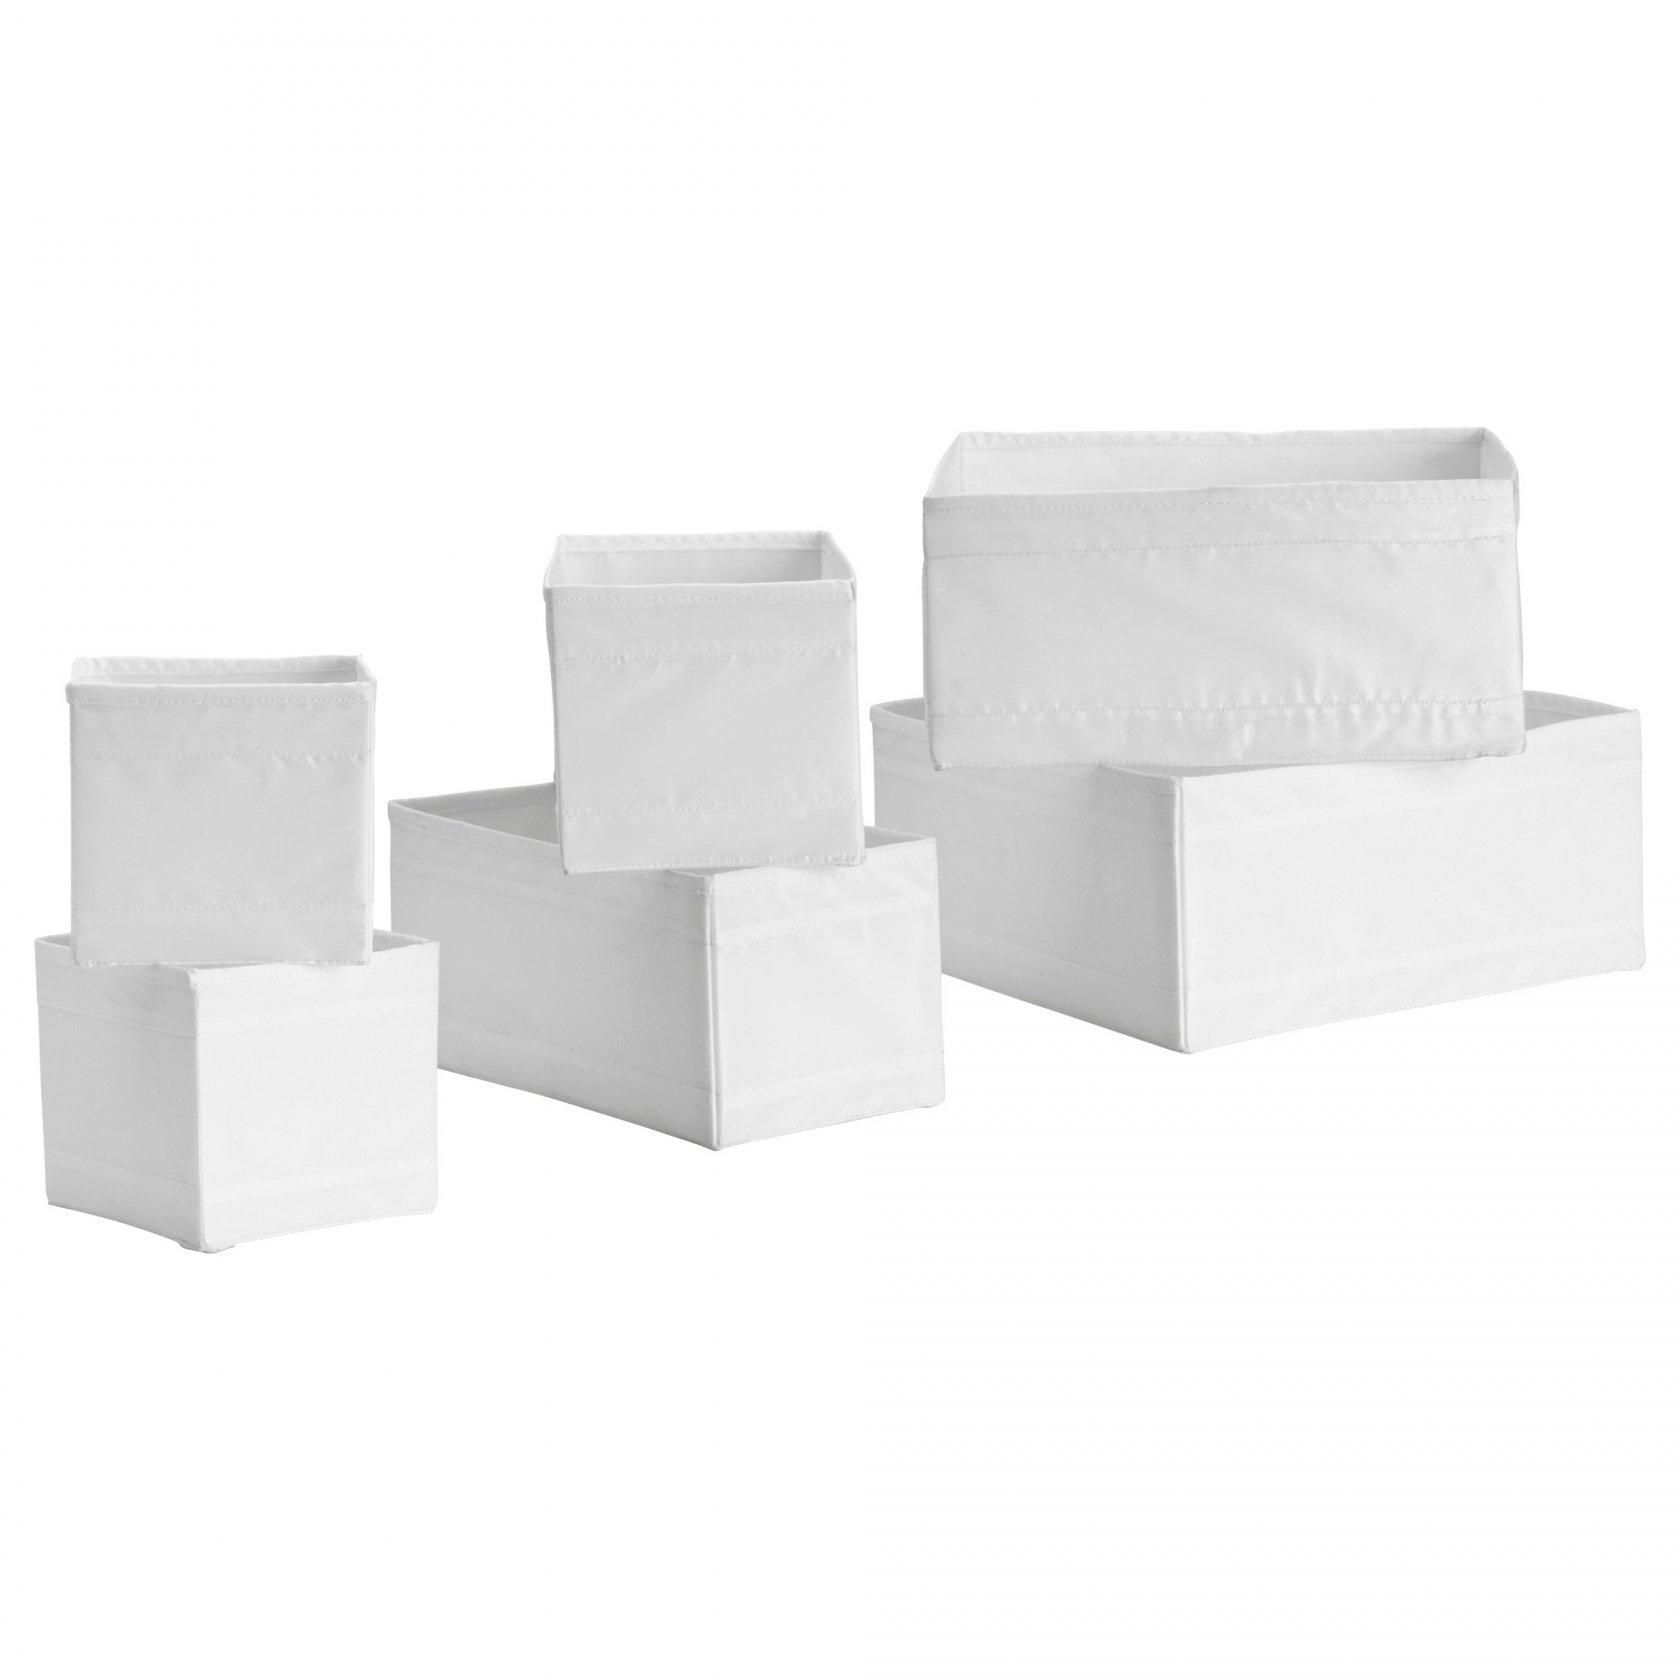 ikea-drawer-dividers-2-skubb-box-set-of-6-ikea-1680-x-1680.jpg